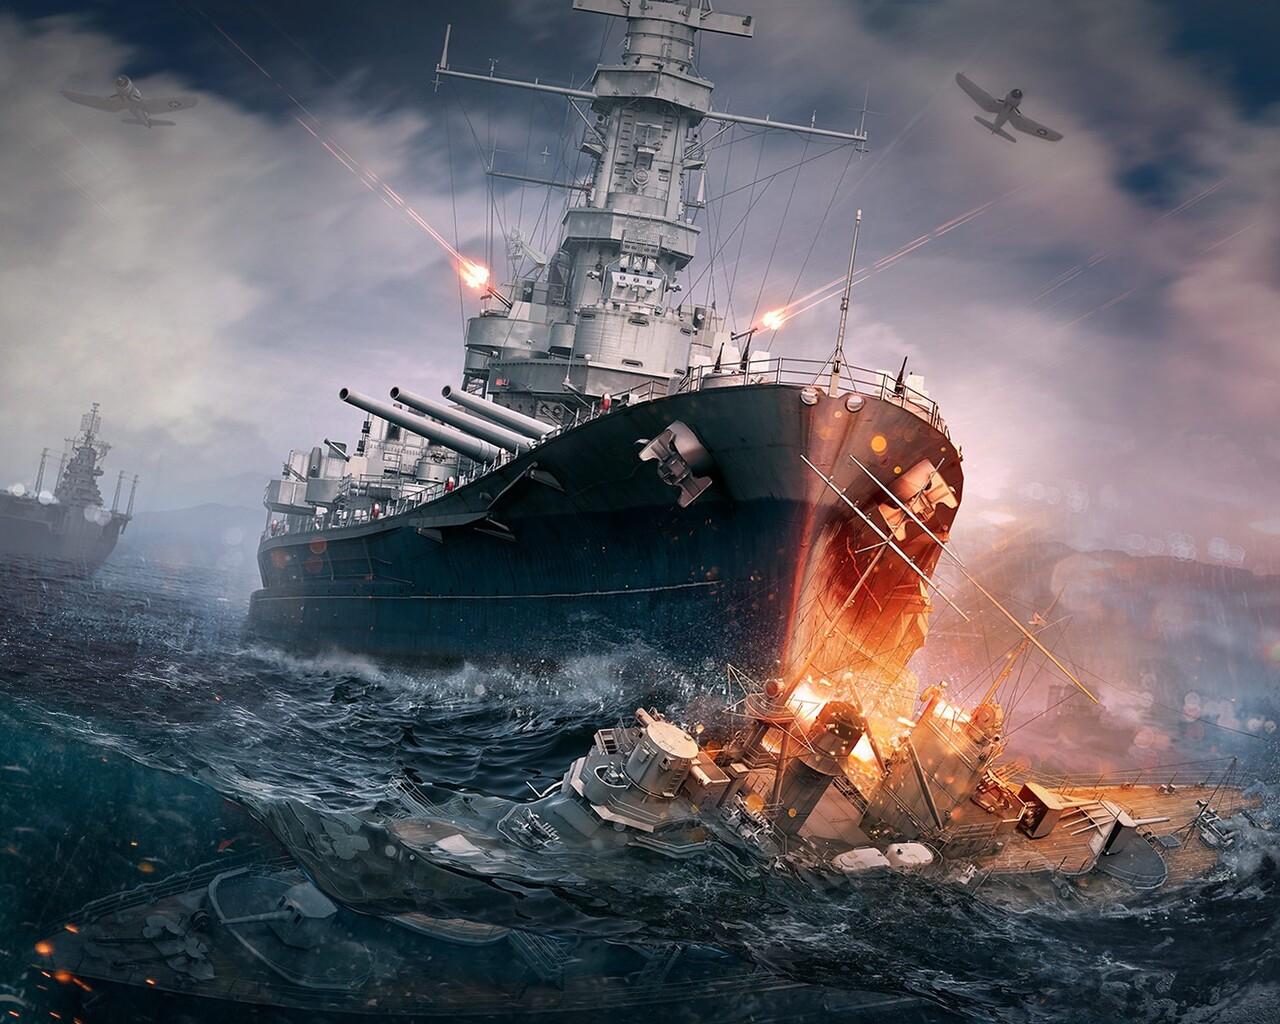 World Of Warships Wallpaper: 1280x1024 World Of Warships 1280x1024 Resolution HD 4k